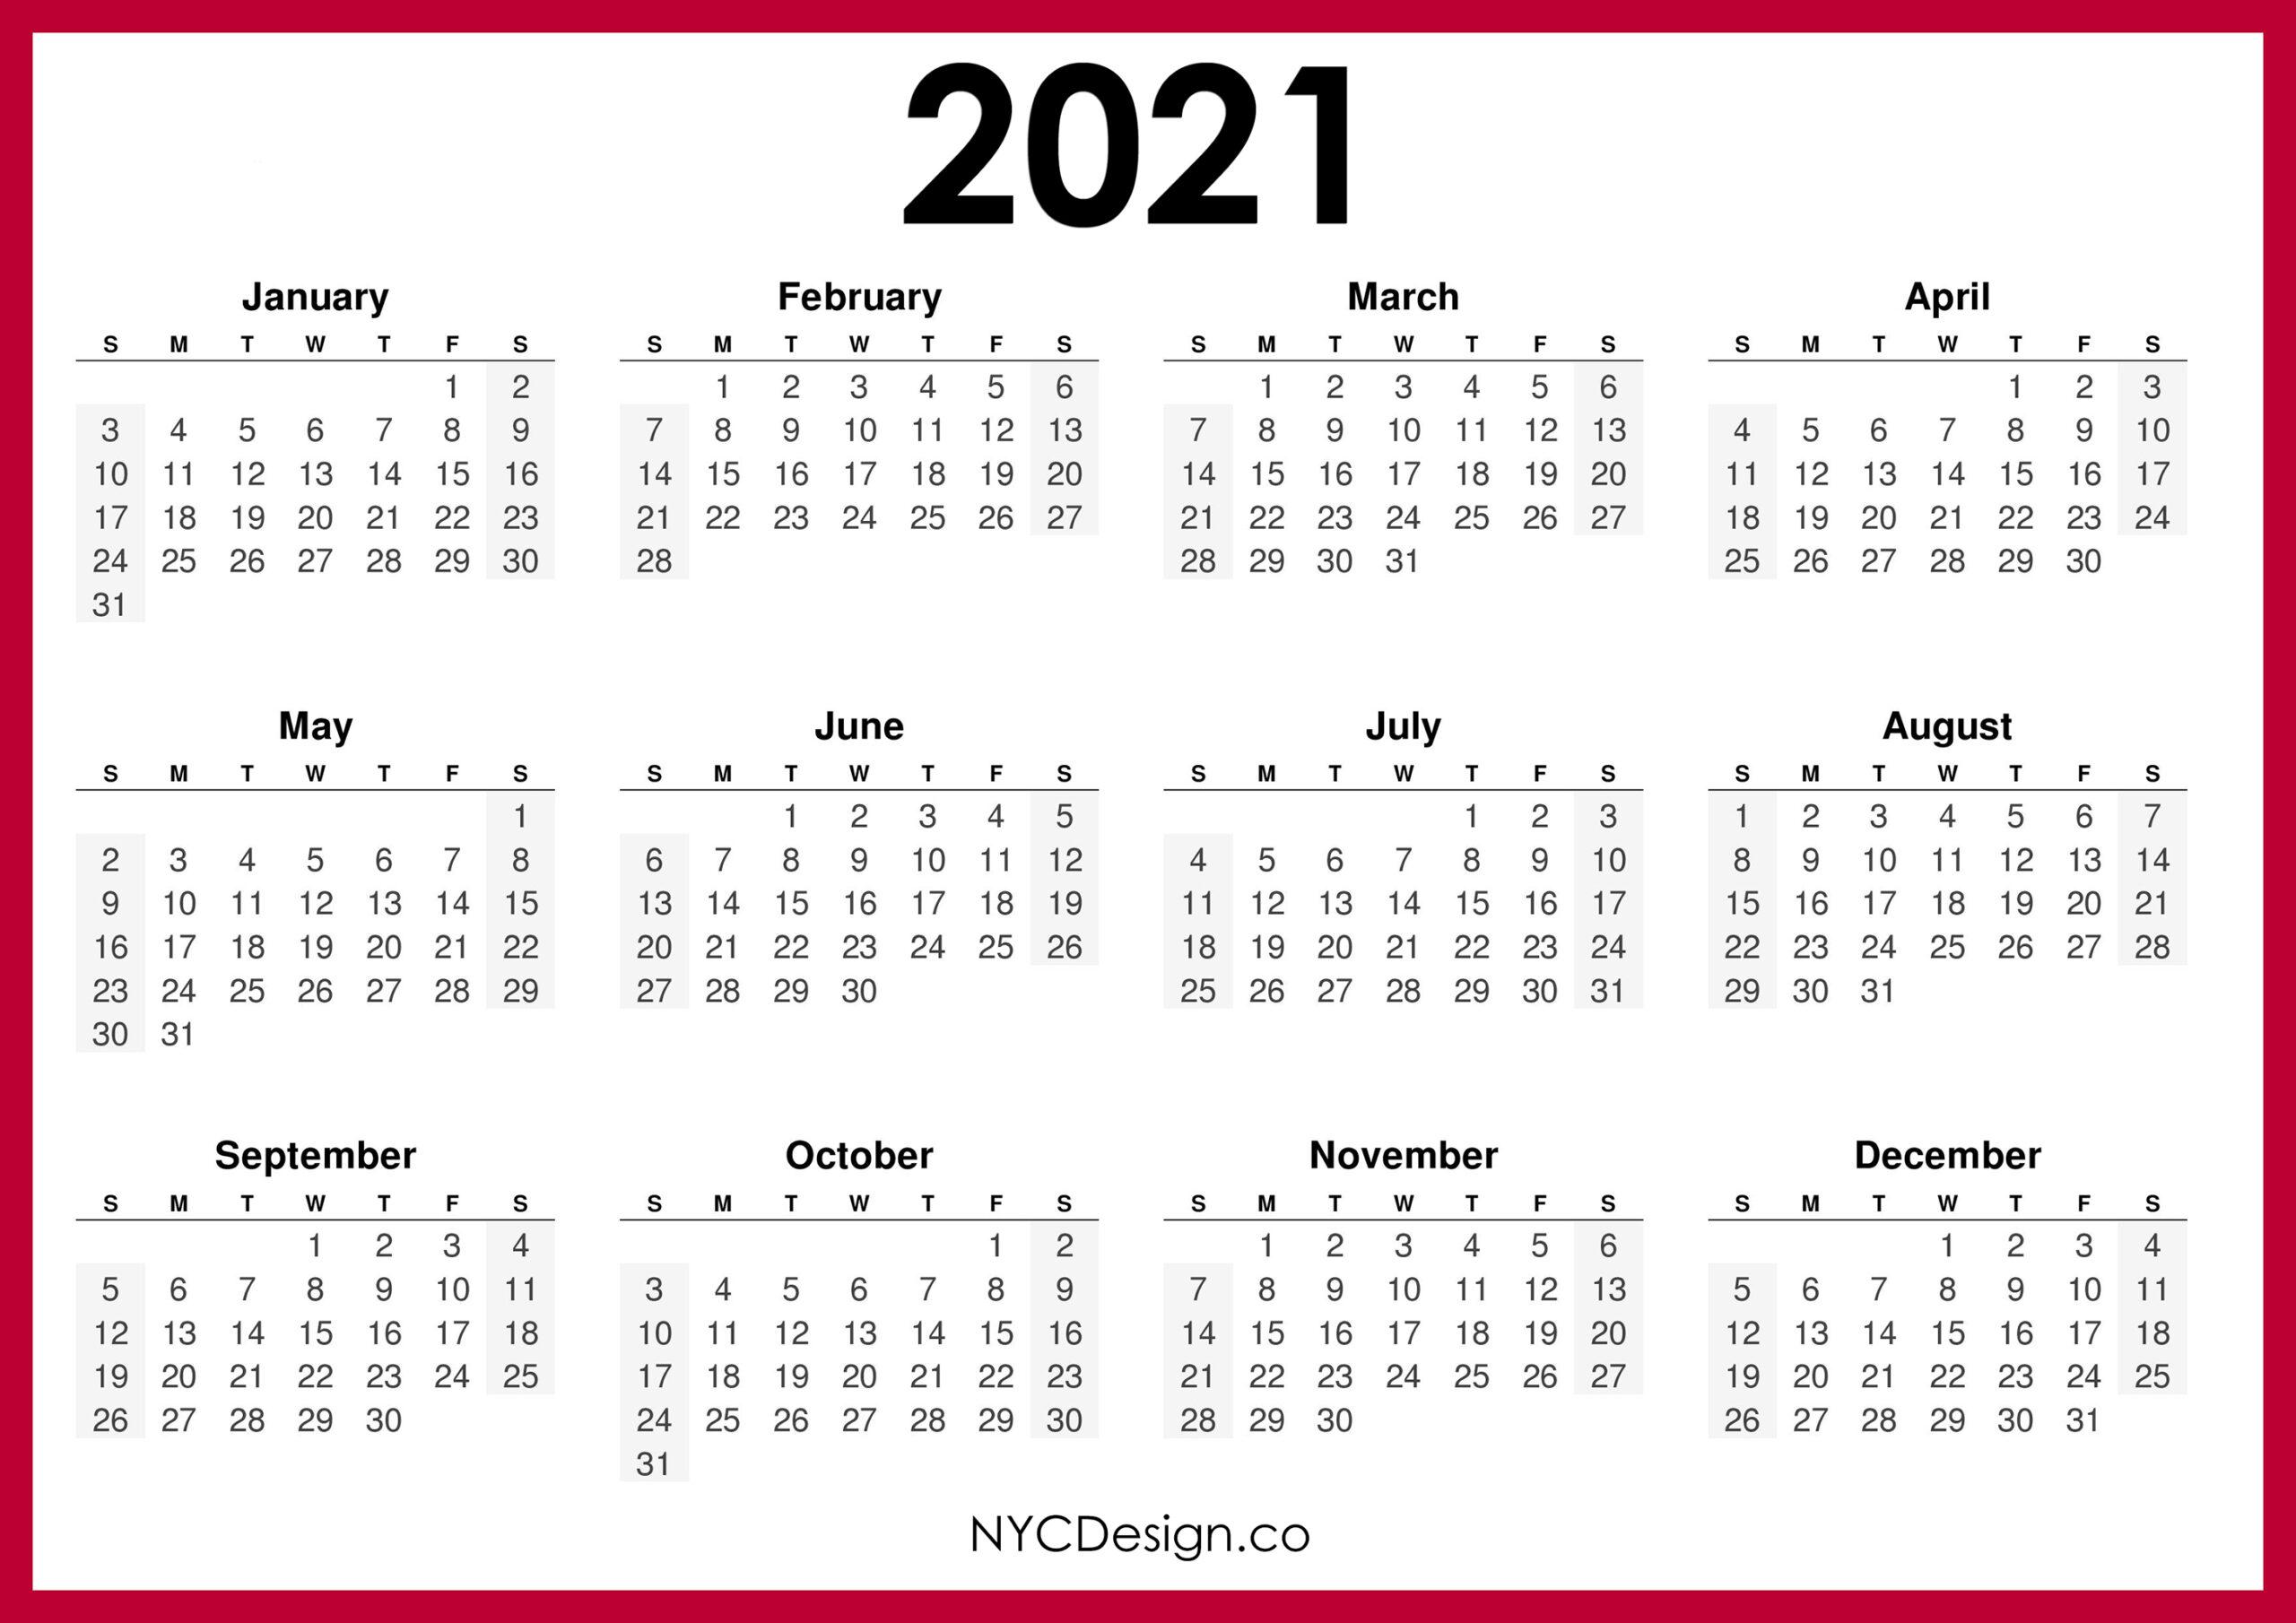 2021 Calendar Printable Free, Horizontal, Red, Hd - Sunday